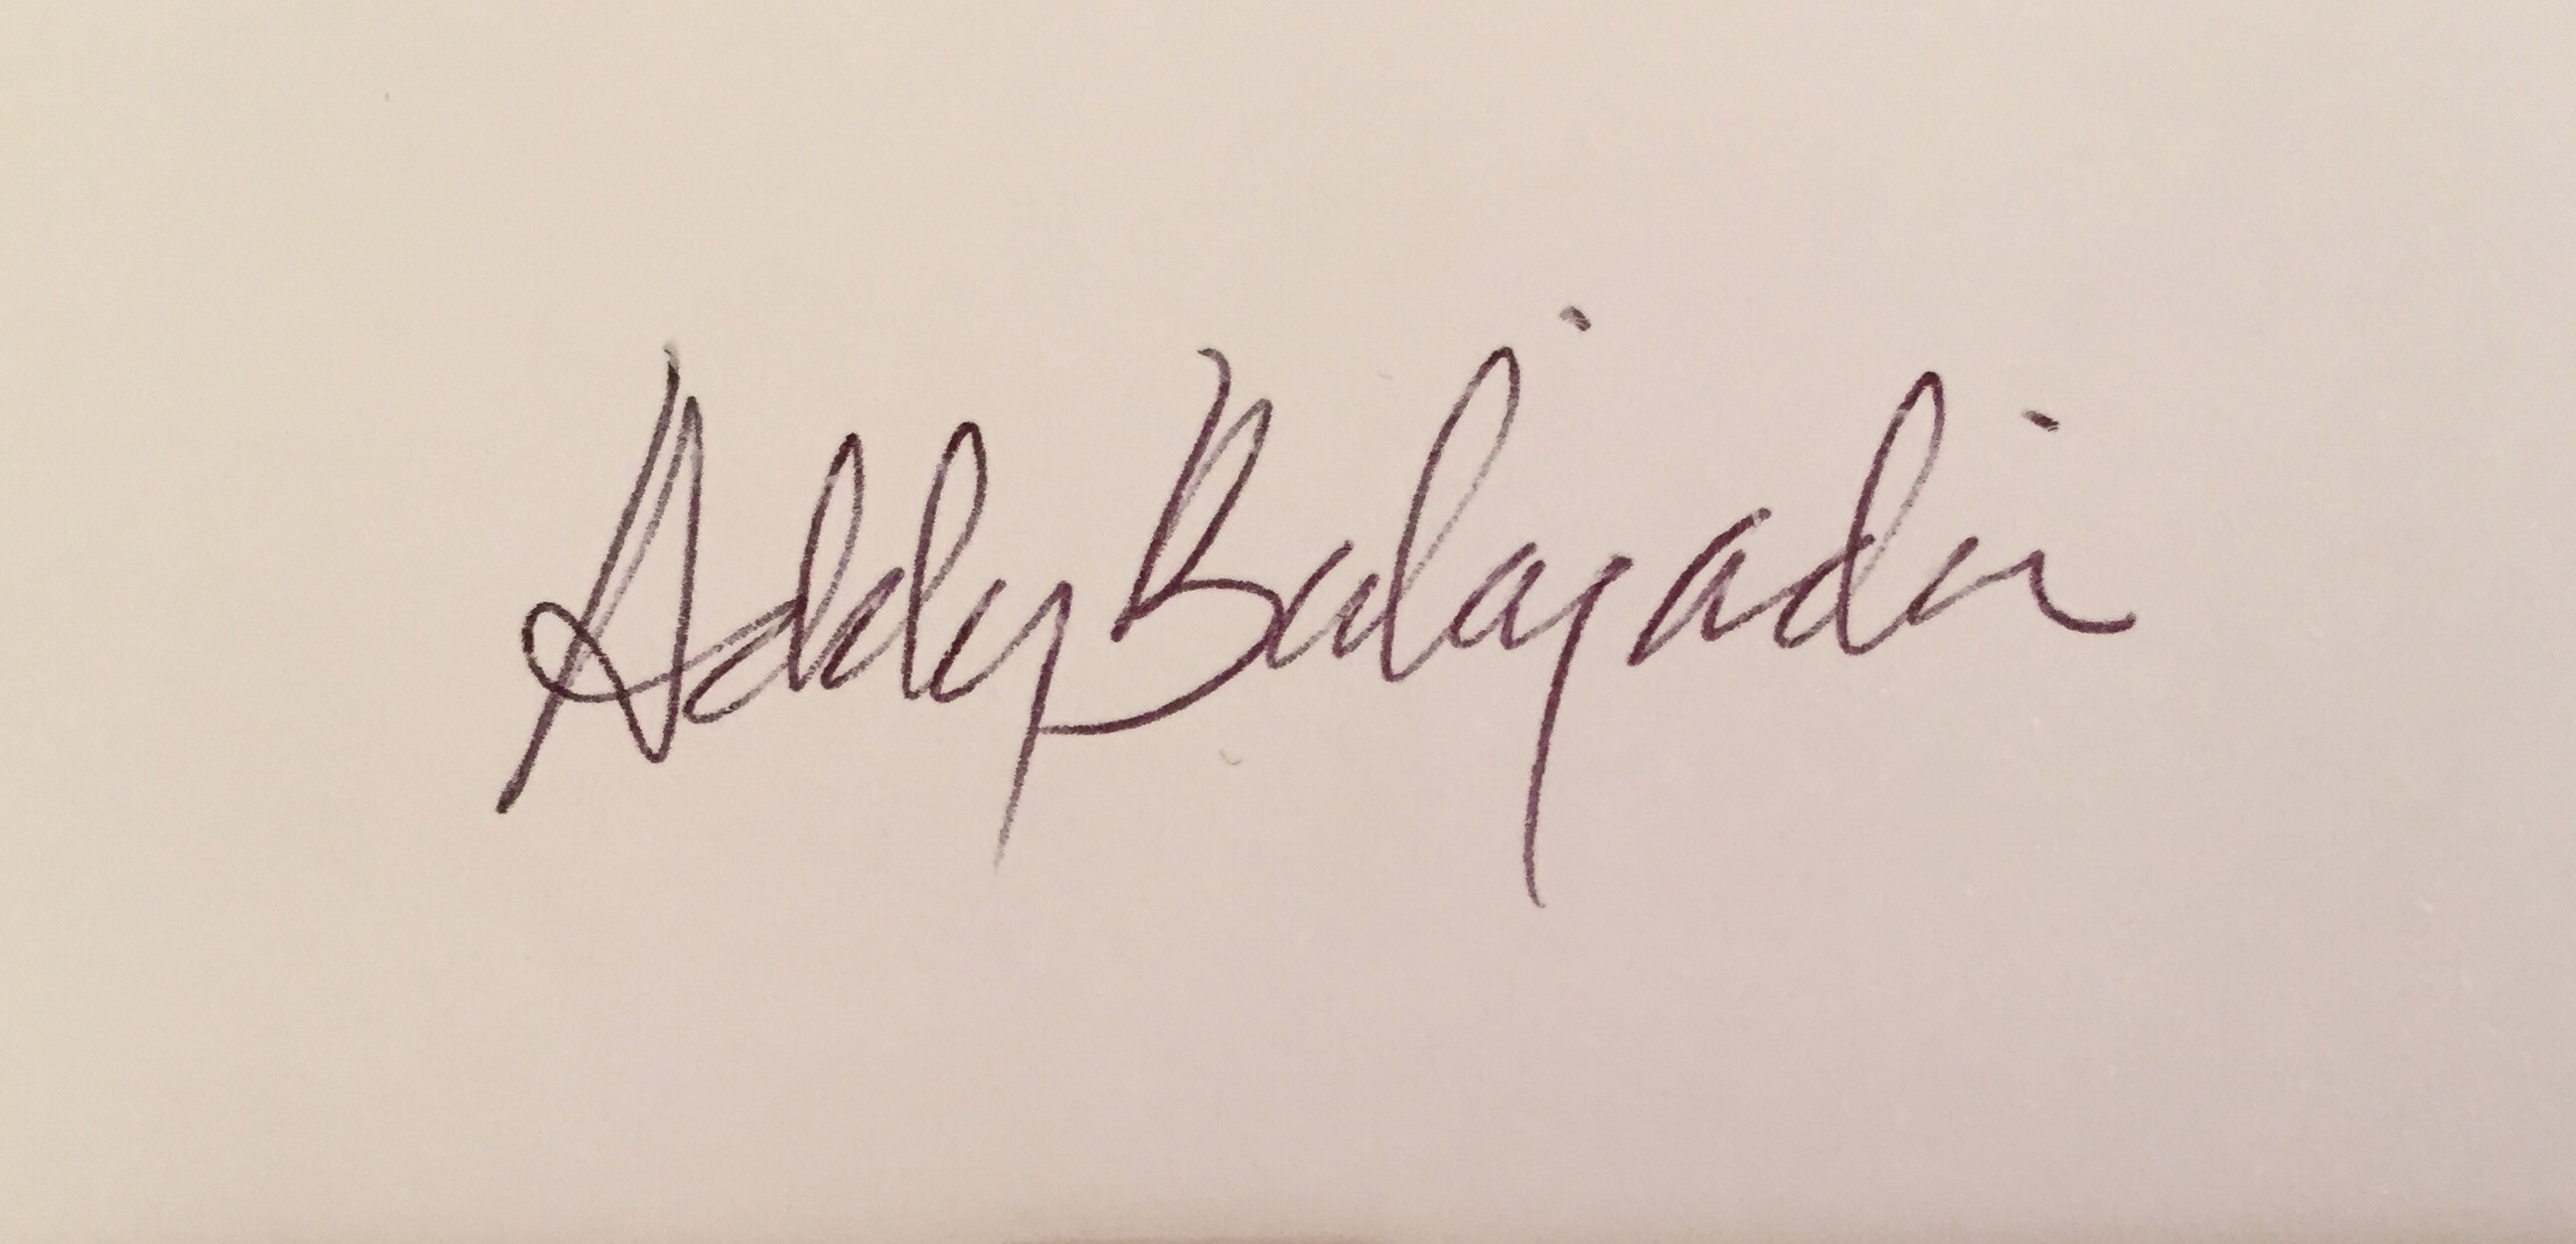 Addy Balajadia's Signature